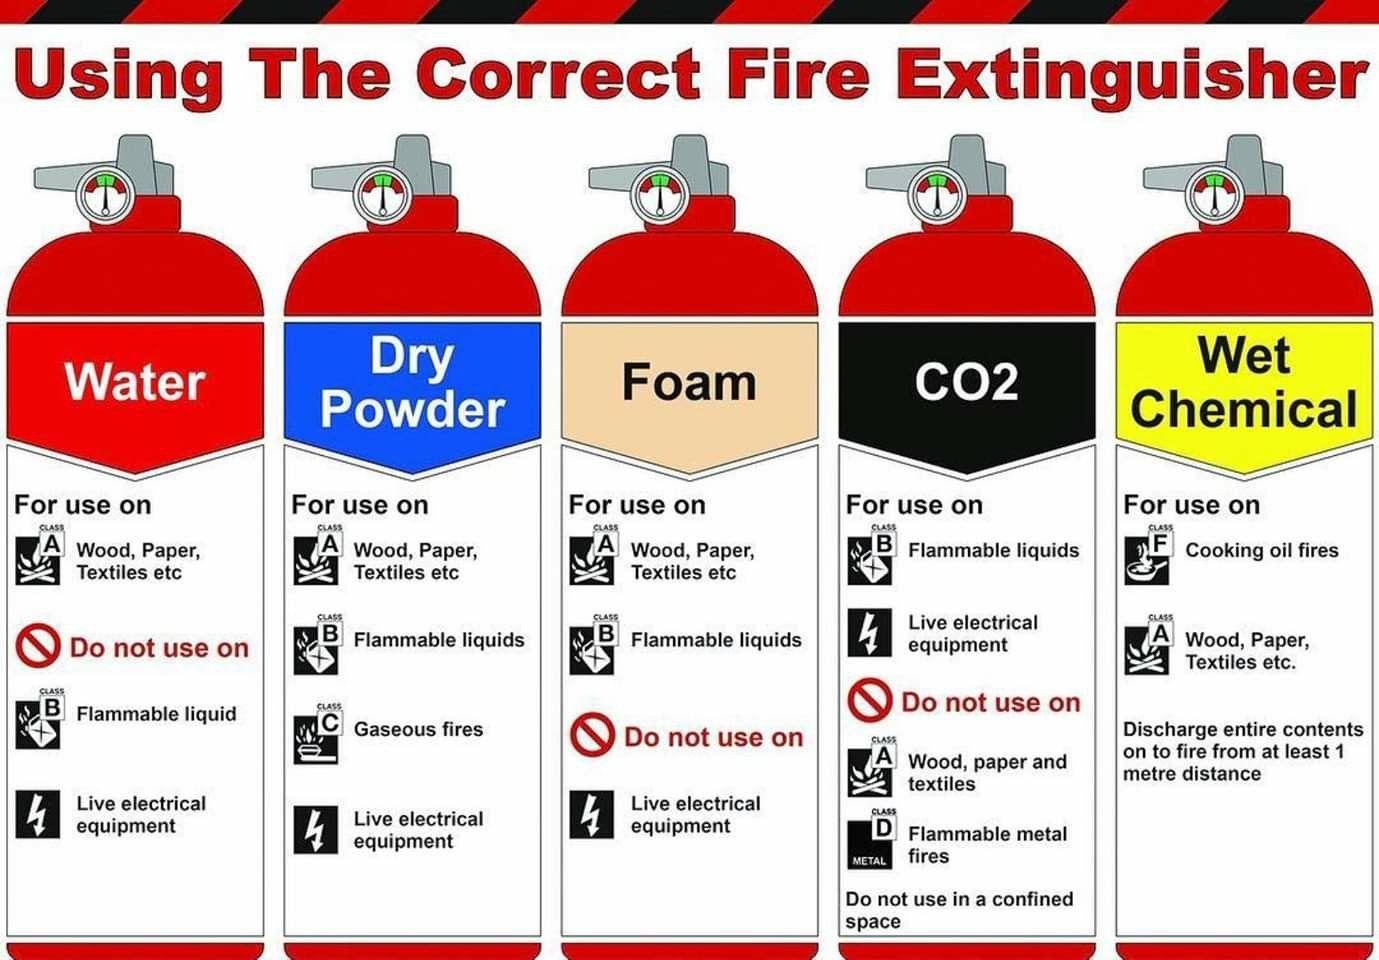 Best Fire Extinguisher For Kitchen Fires